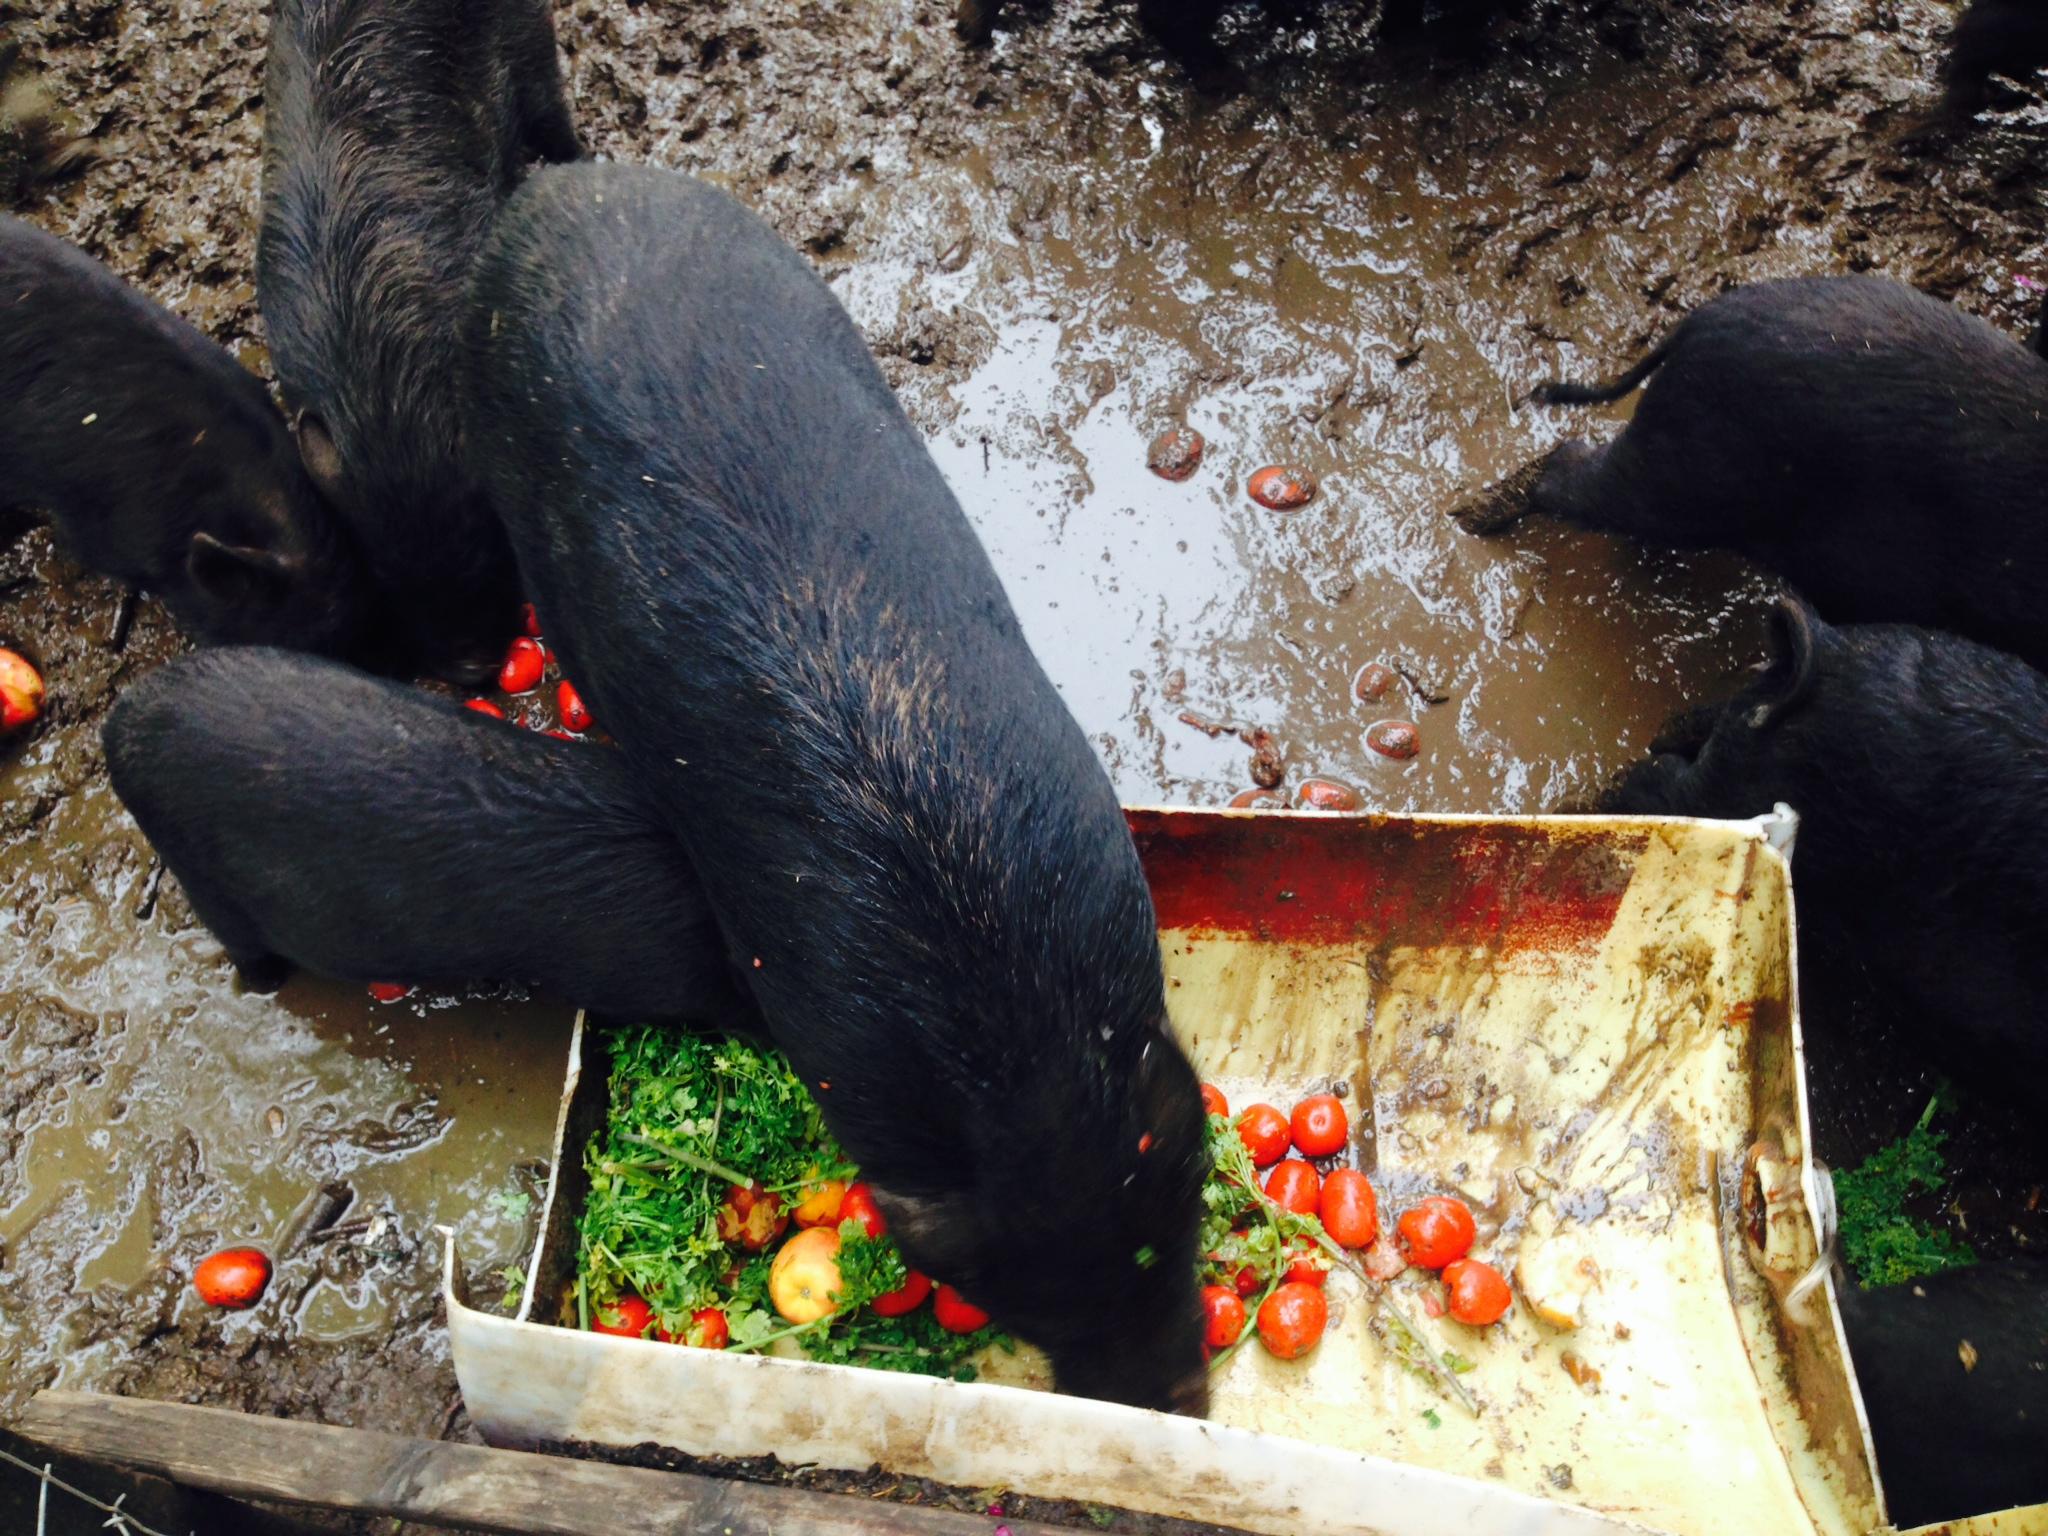 Feed animals.JPG